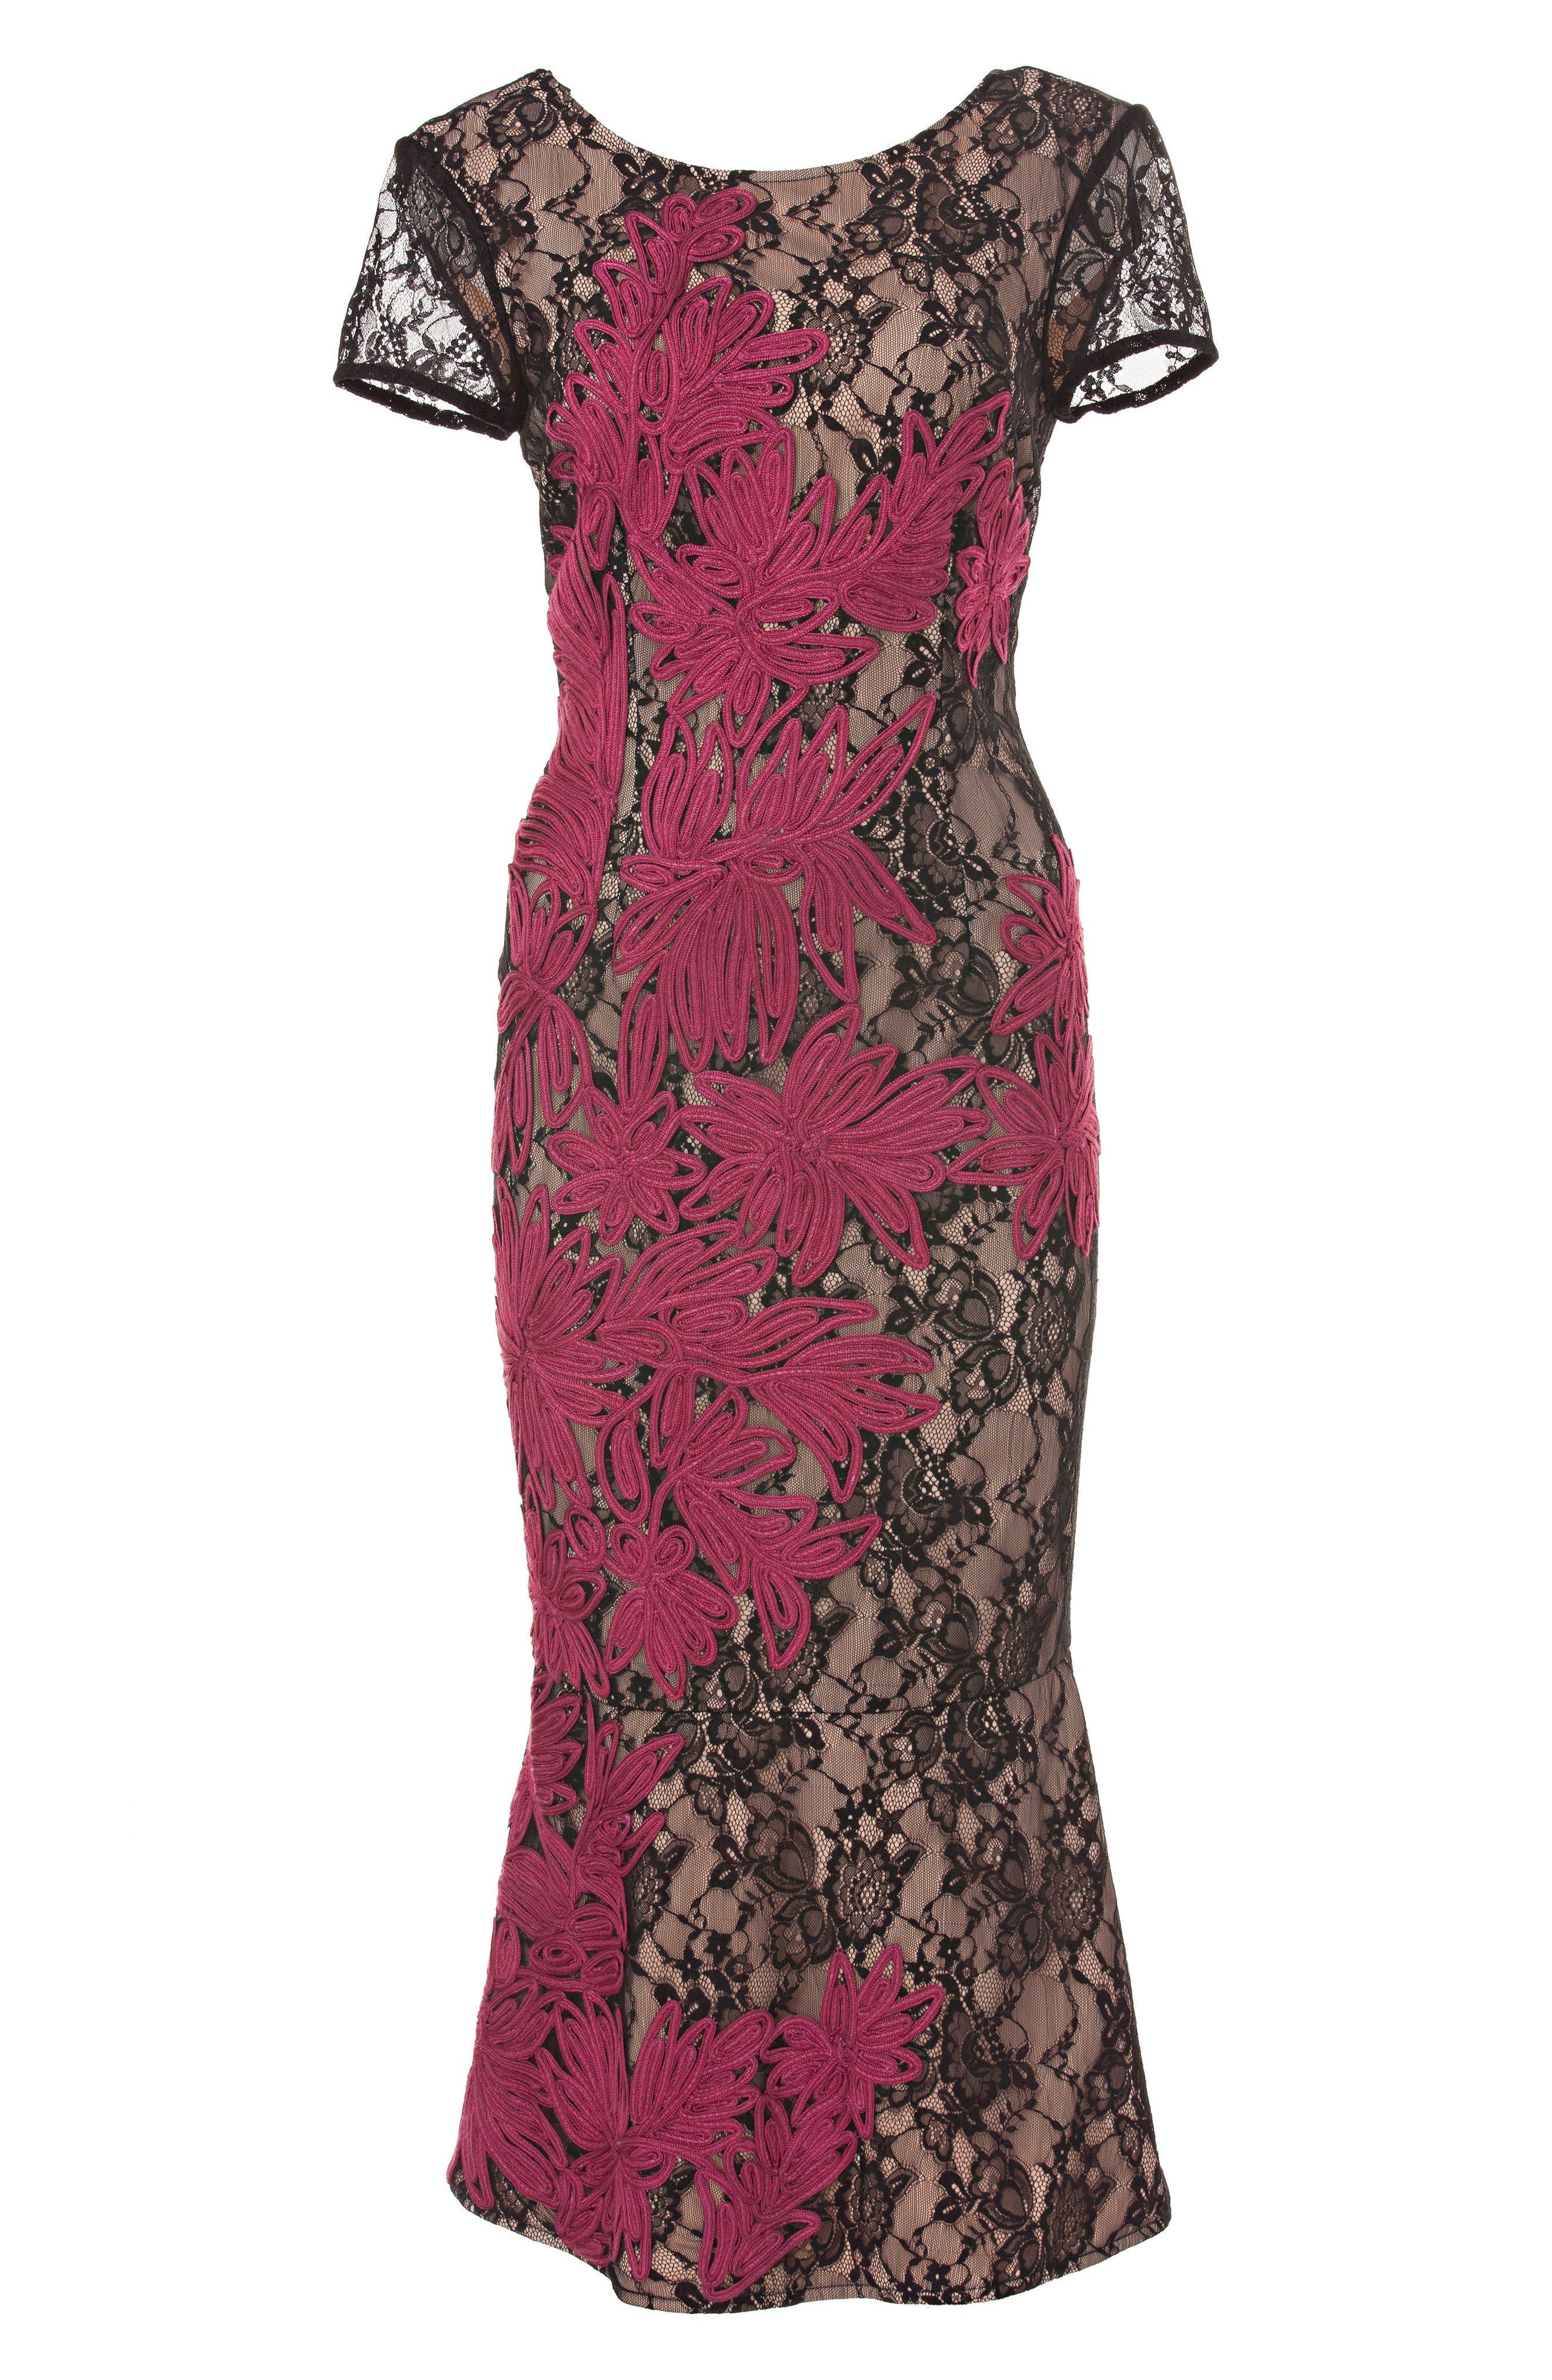 JS COLLECTIONS, Soutache Embroidered Lace Dress, Alternate thumbnail 4, color, BLACK/ MAGENTA